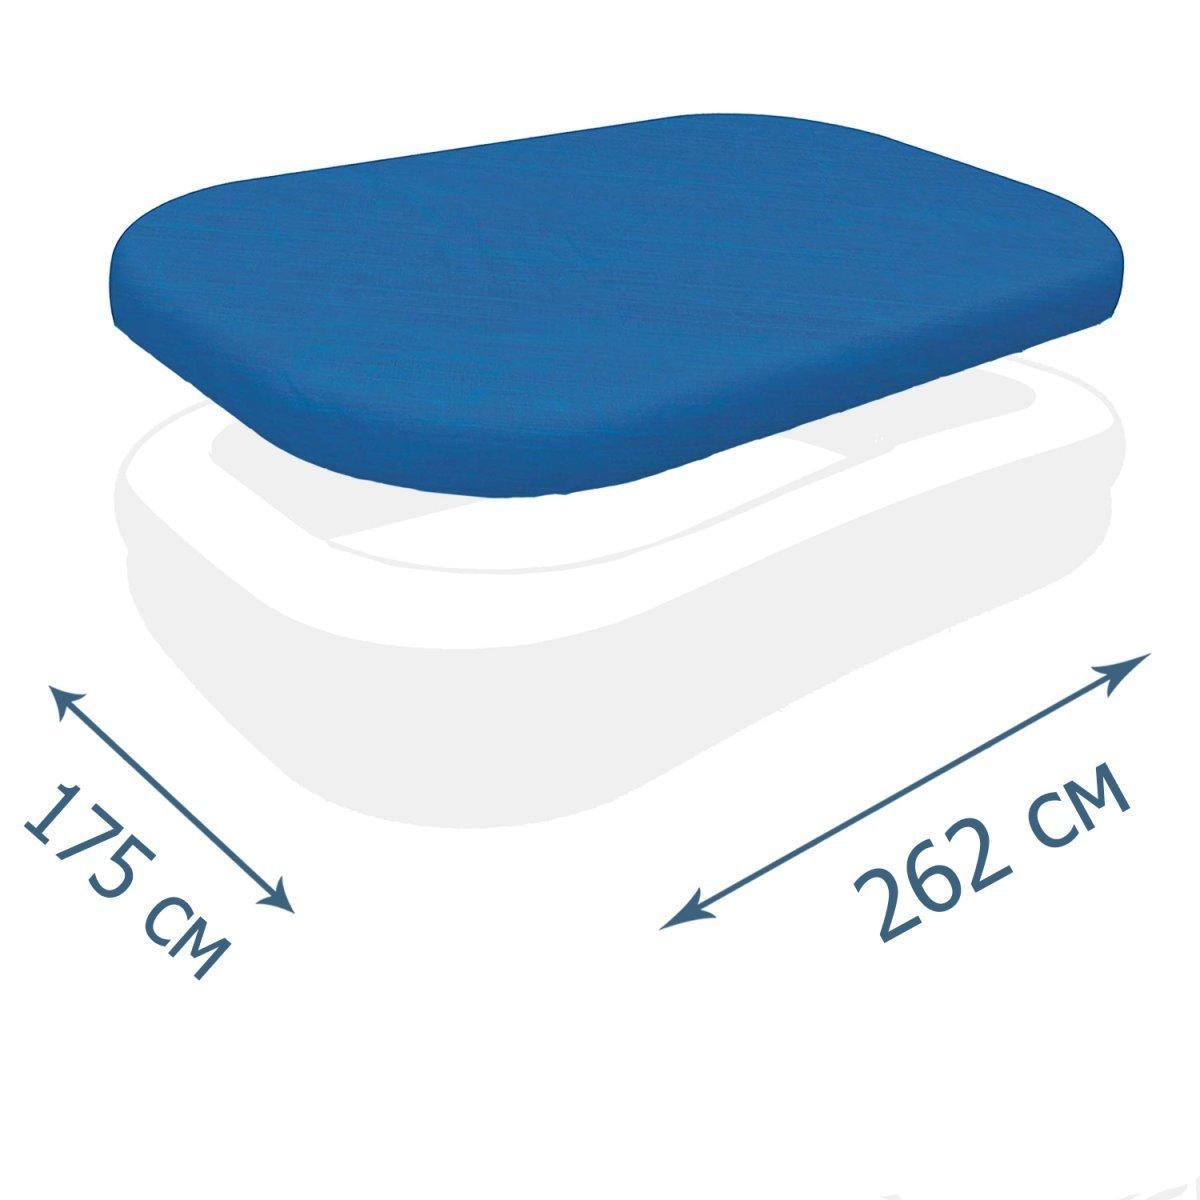 Тент - чехол для надувного бассейна Bestway 58319, 262 x 175 x 51 см